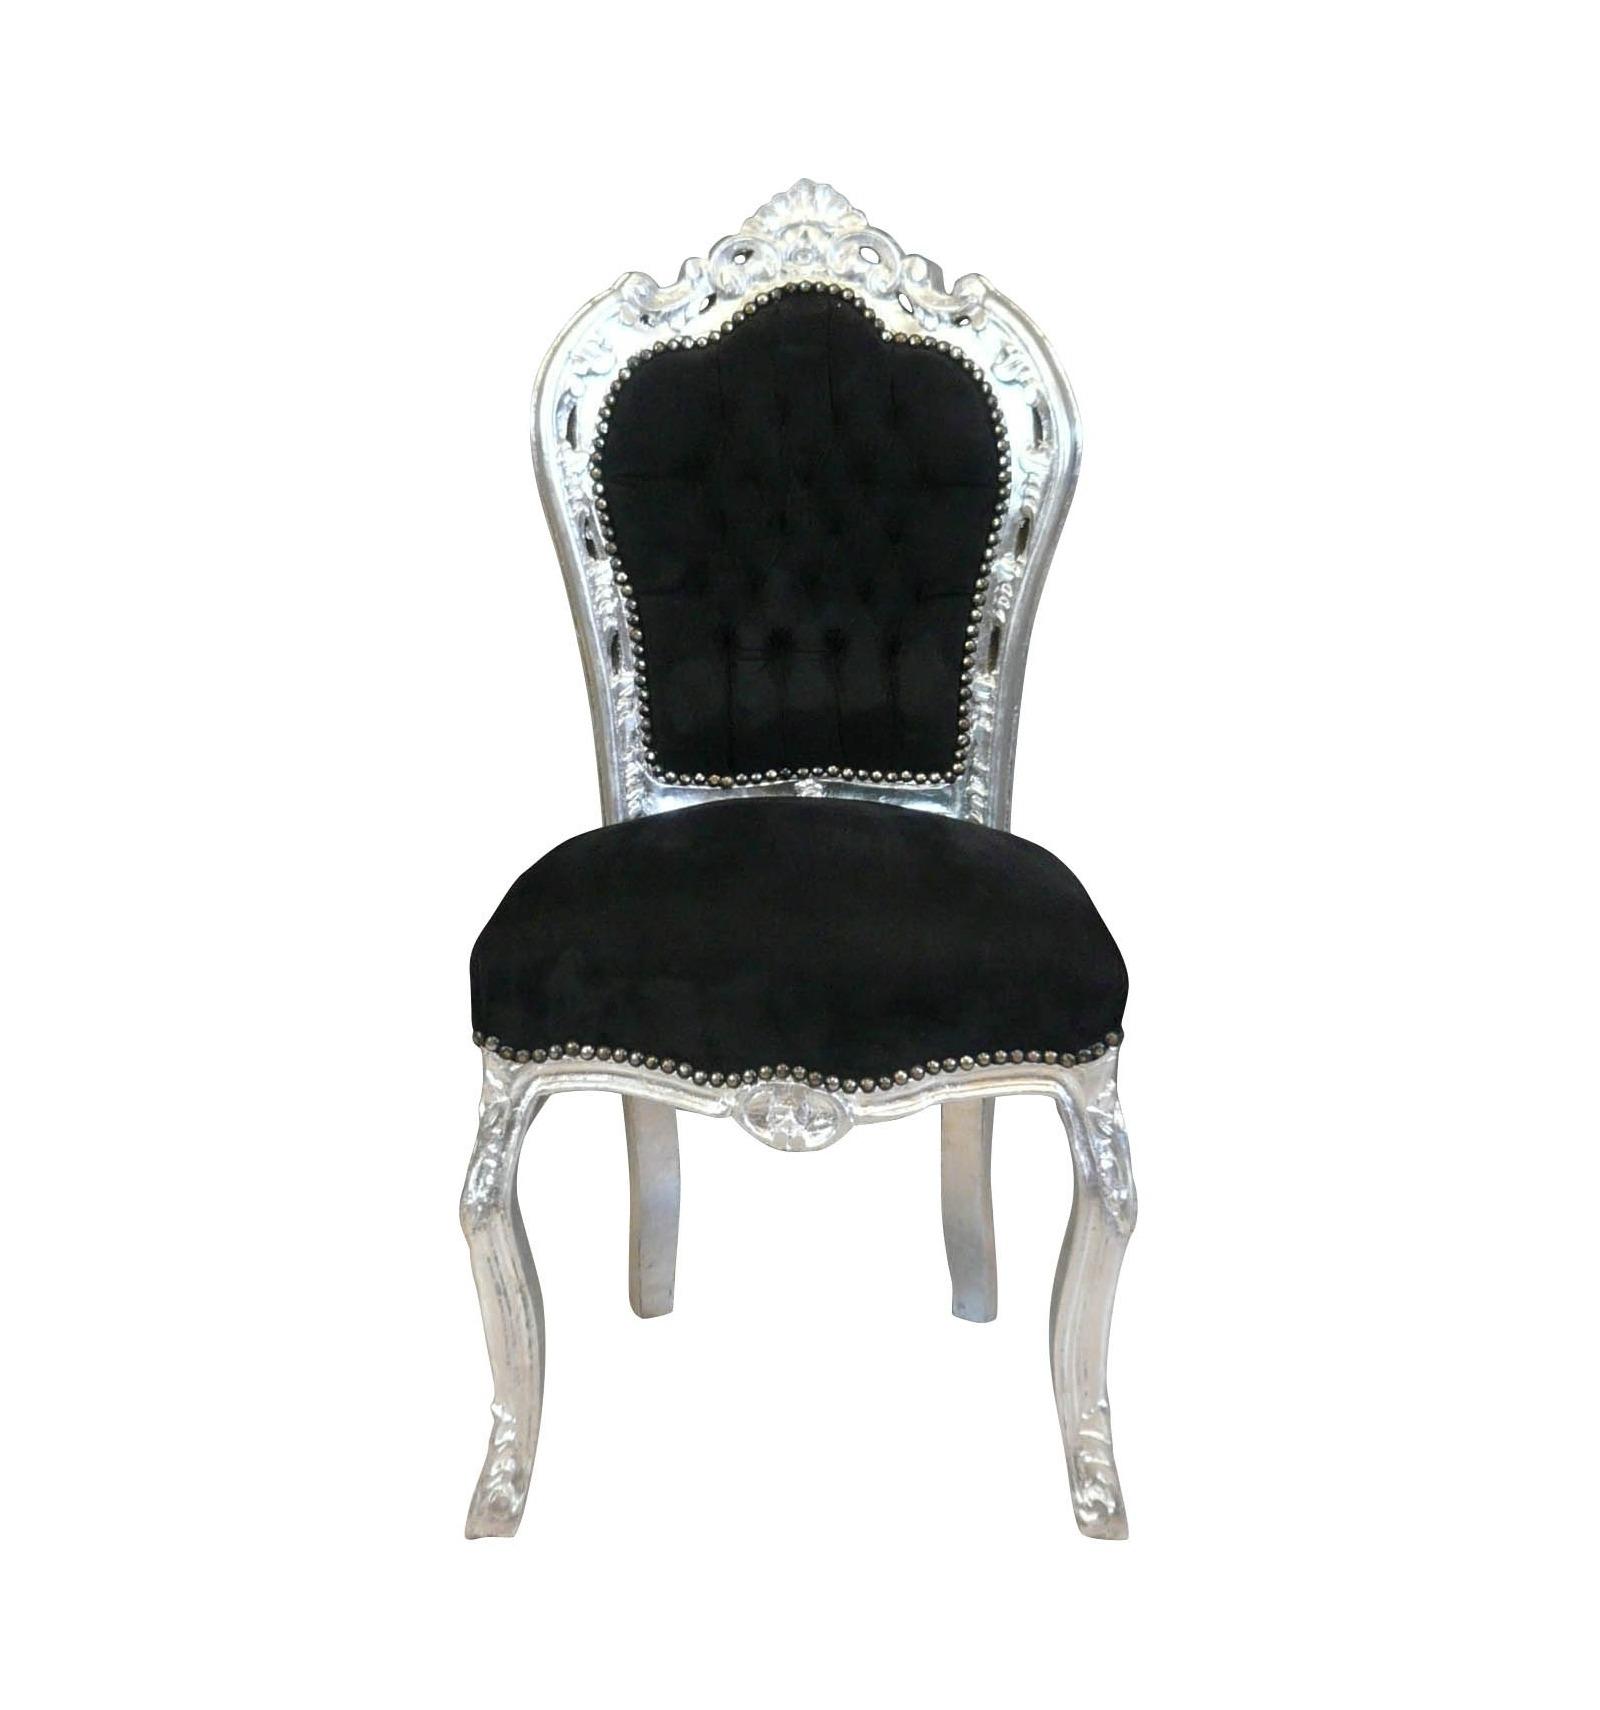 baroque black and silver chair with velvet fabric baroque chairsbaroque black and silver chair with velvet fabric